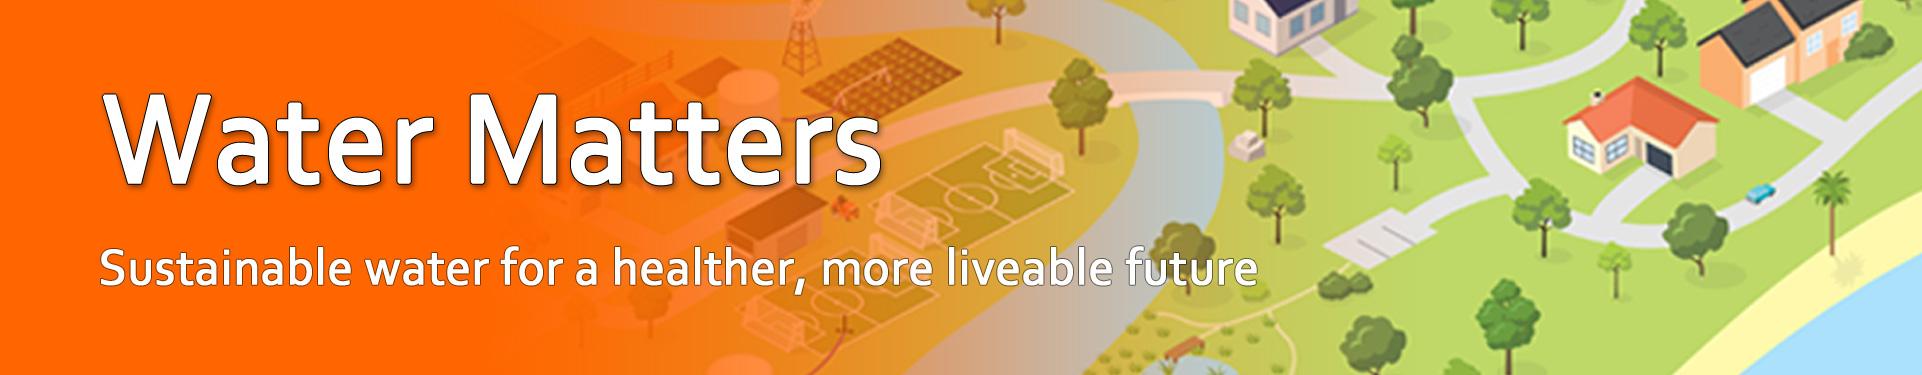 Unitywater Water Matter Plan